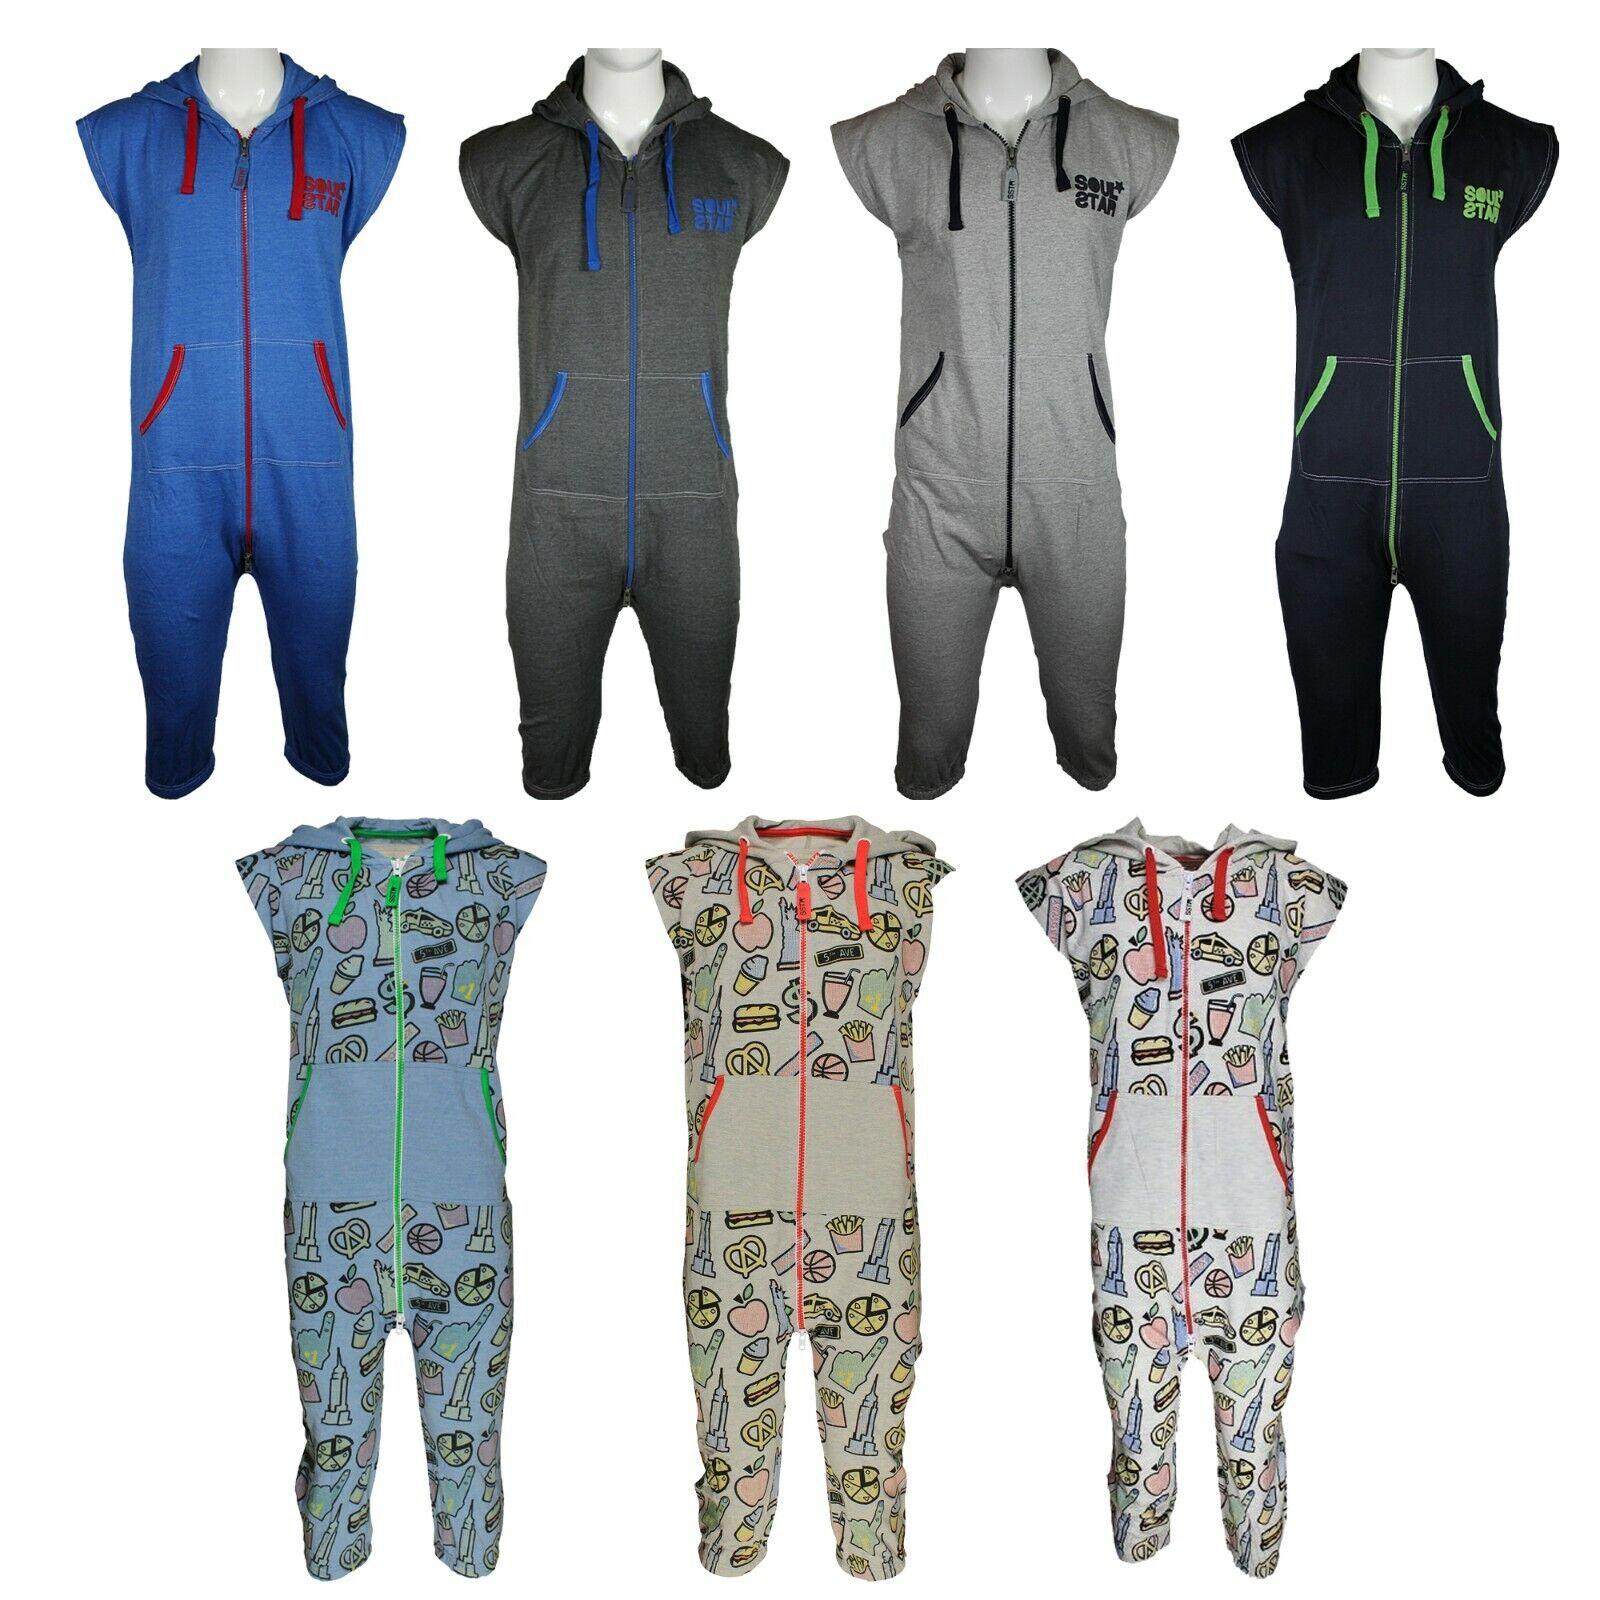 Camille Mens Fleece Hooded Pyjama Onesie